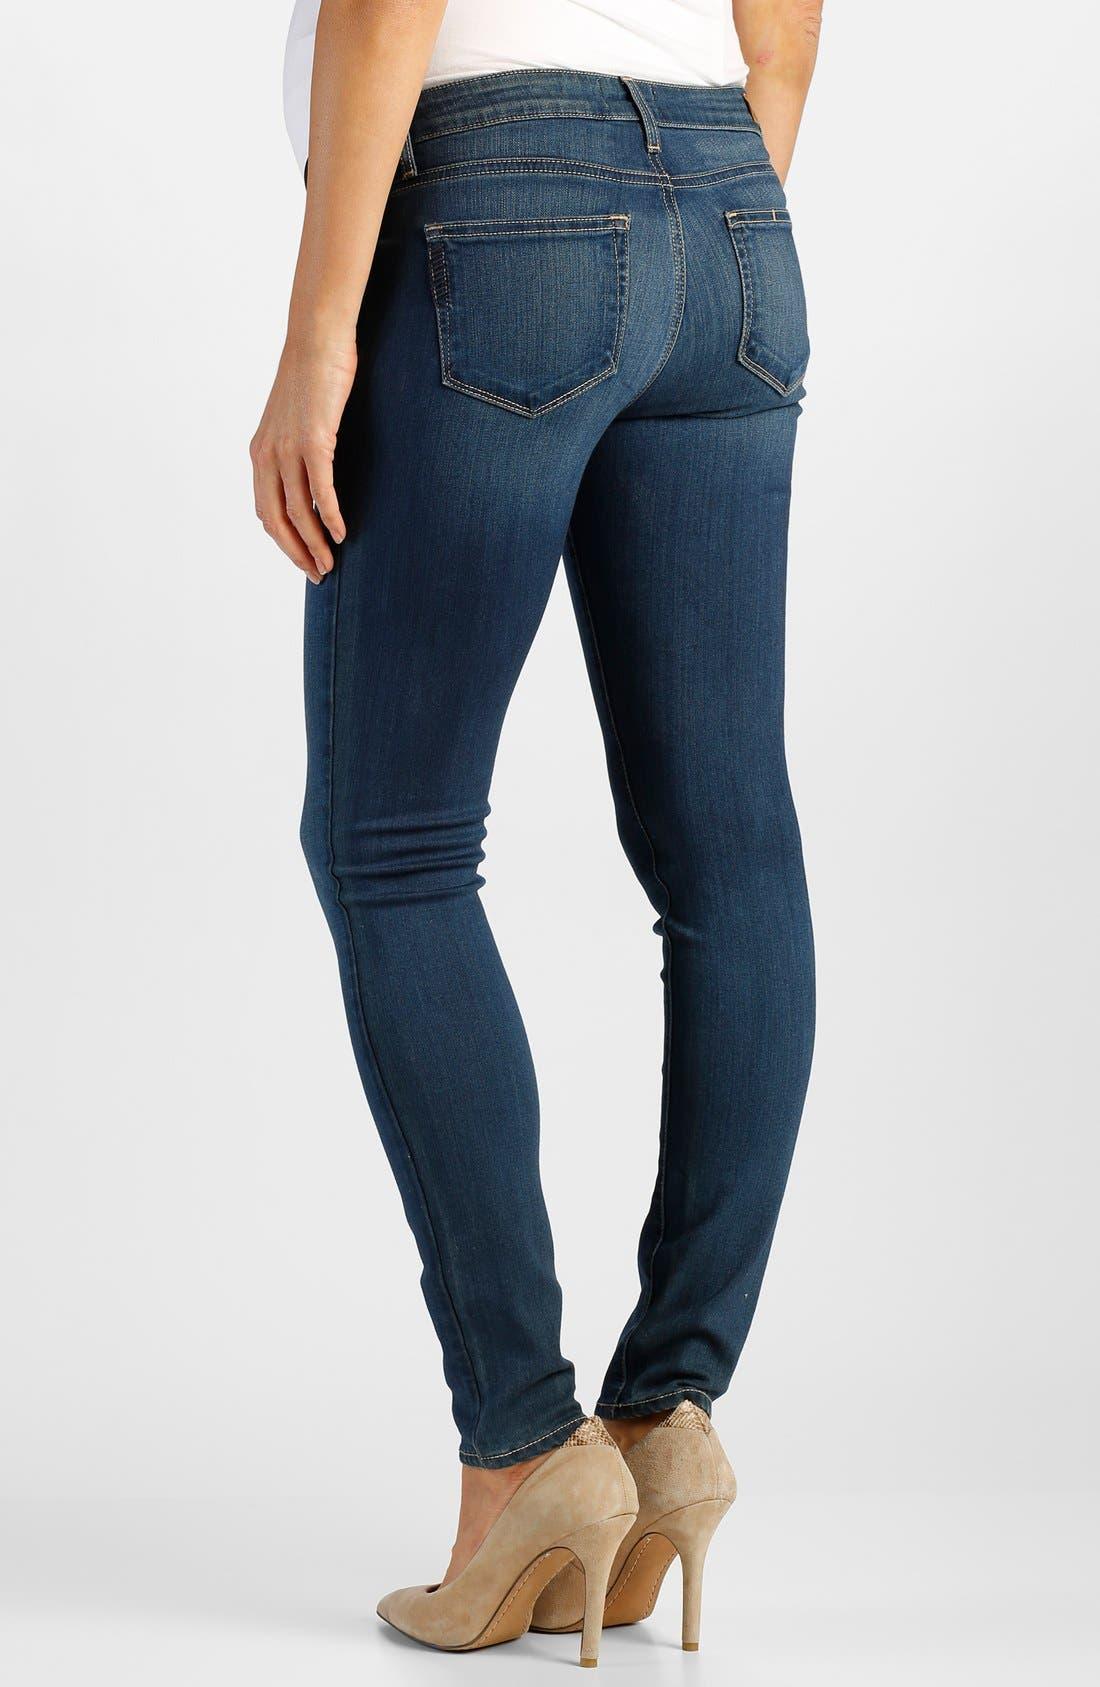 Alternate Image 2  - Paige Denim 'Transcend - Verdugo' Maternity Ankle Jeans with Side Gussets (Lex)